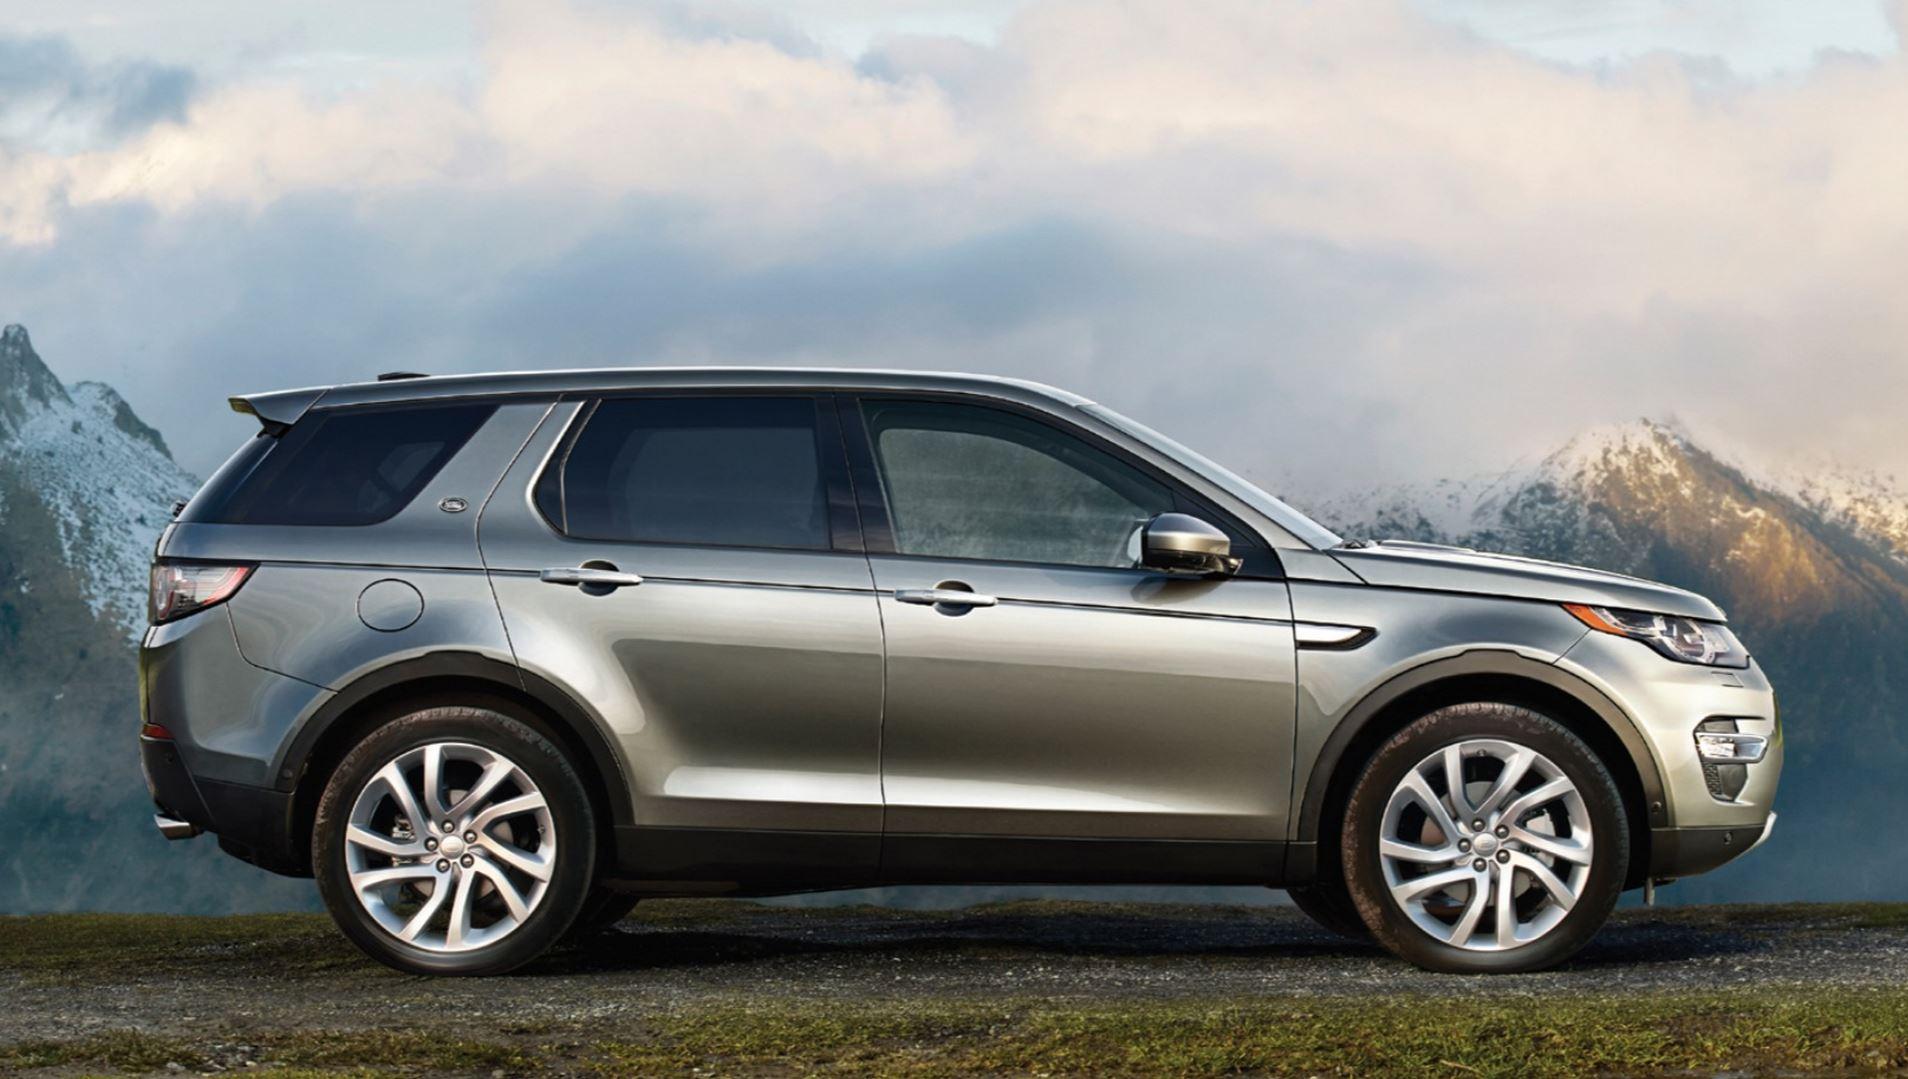 2015 Land Rover Discovery Rover Sport 30 Car Desktop Background